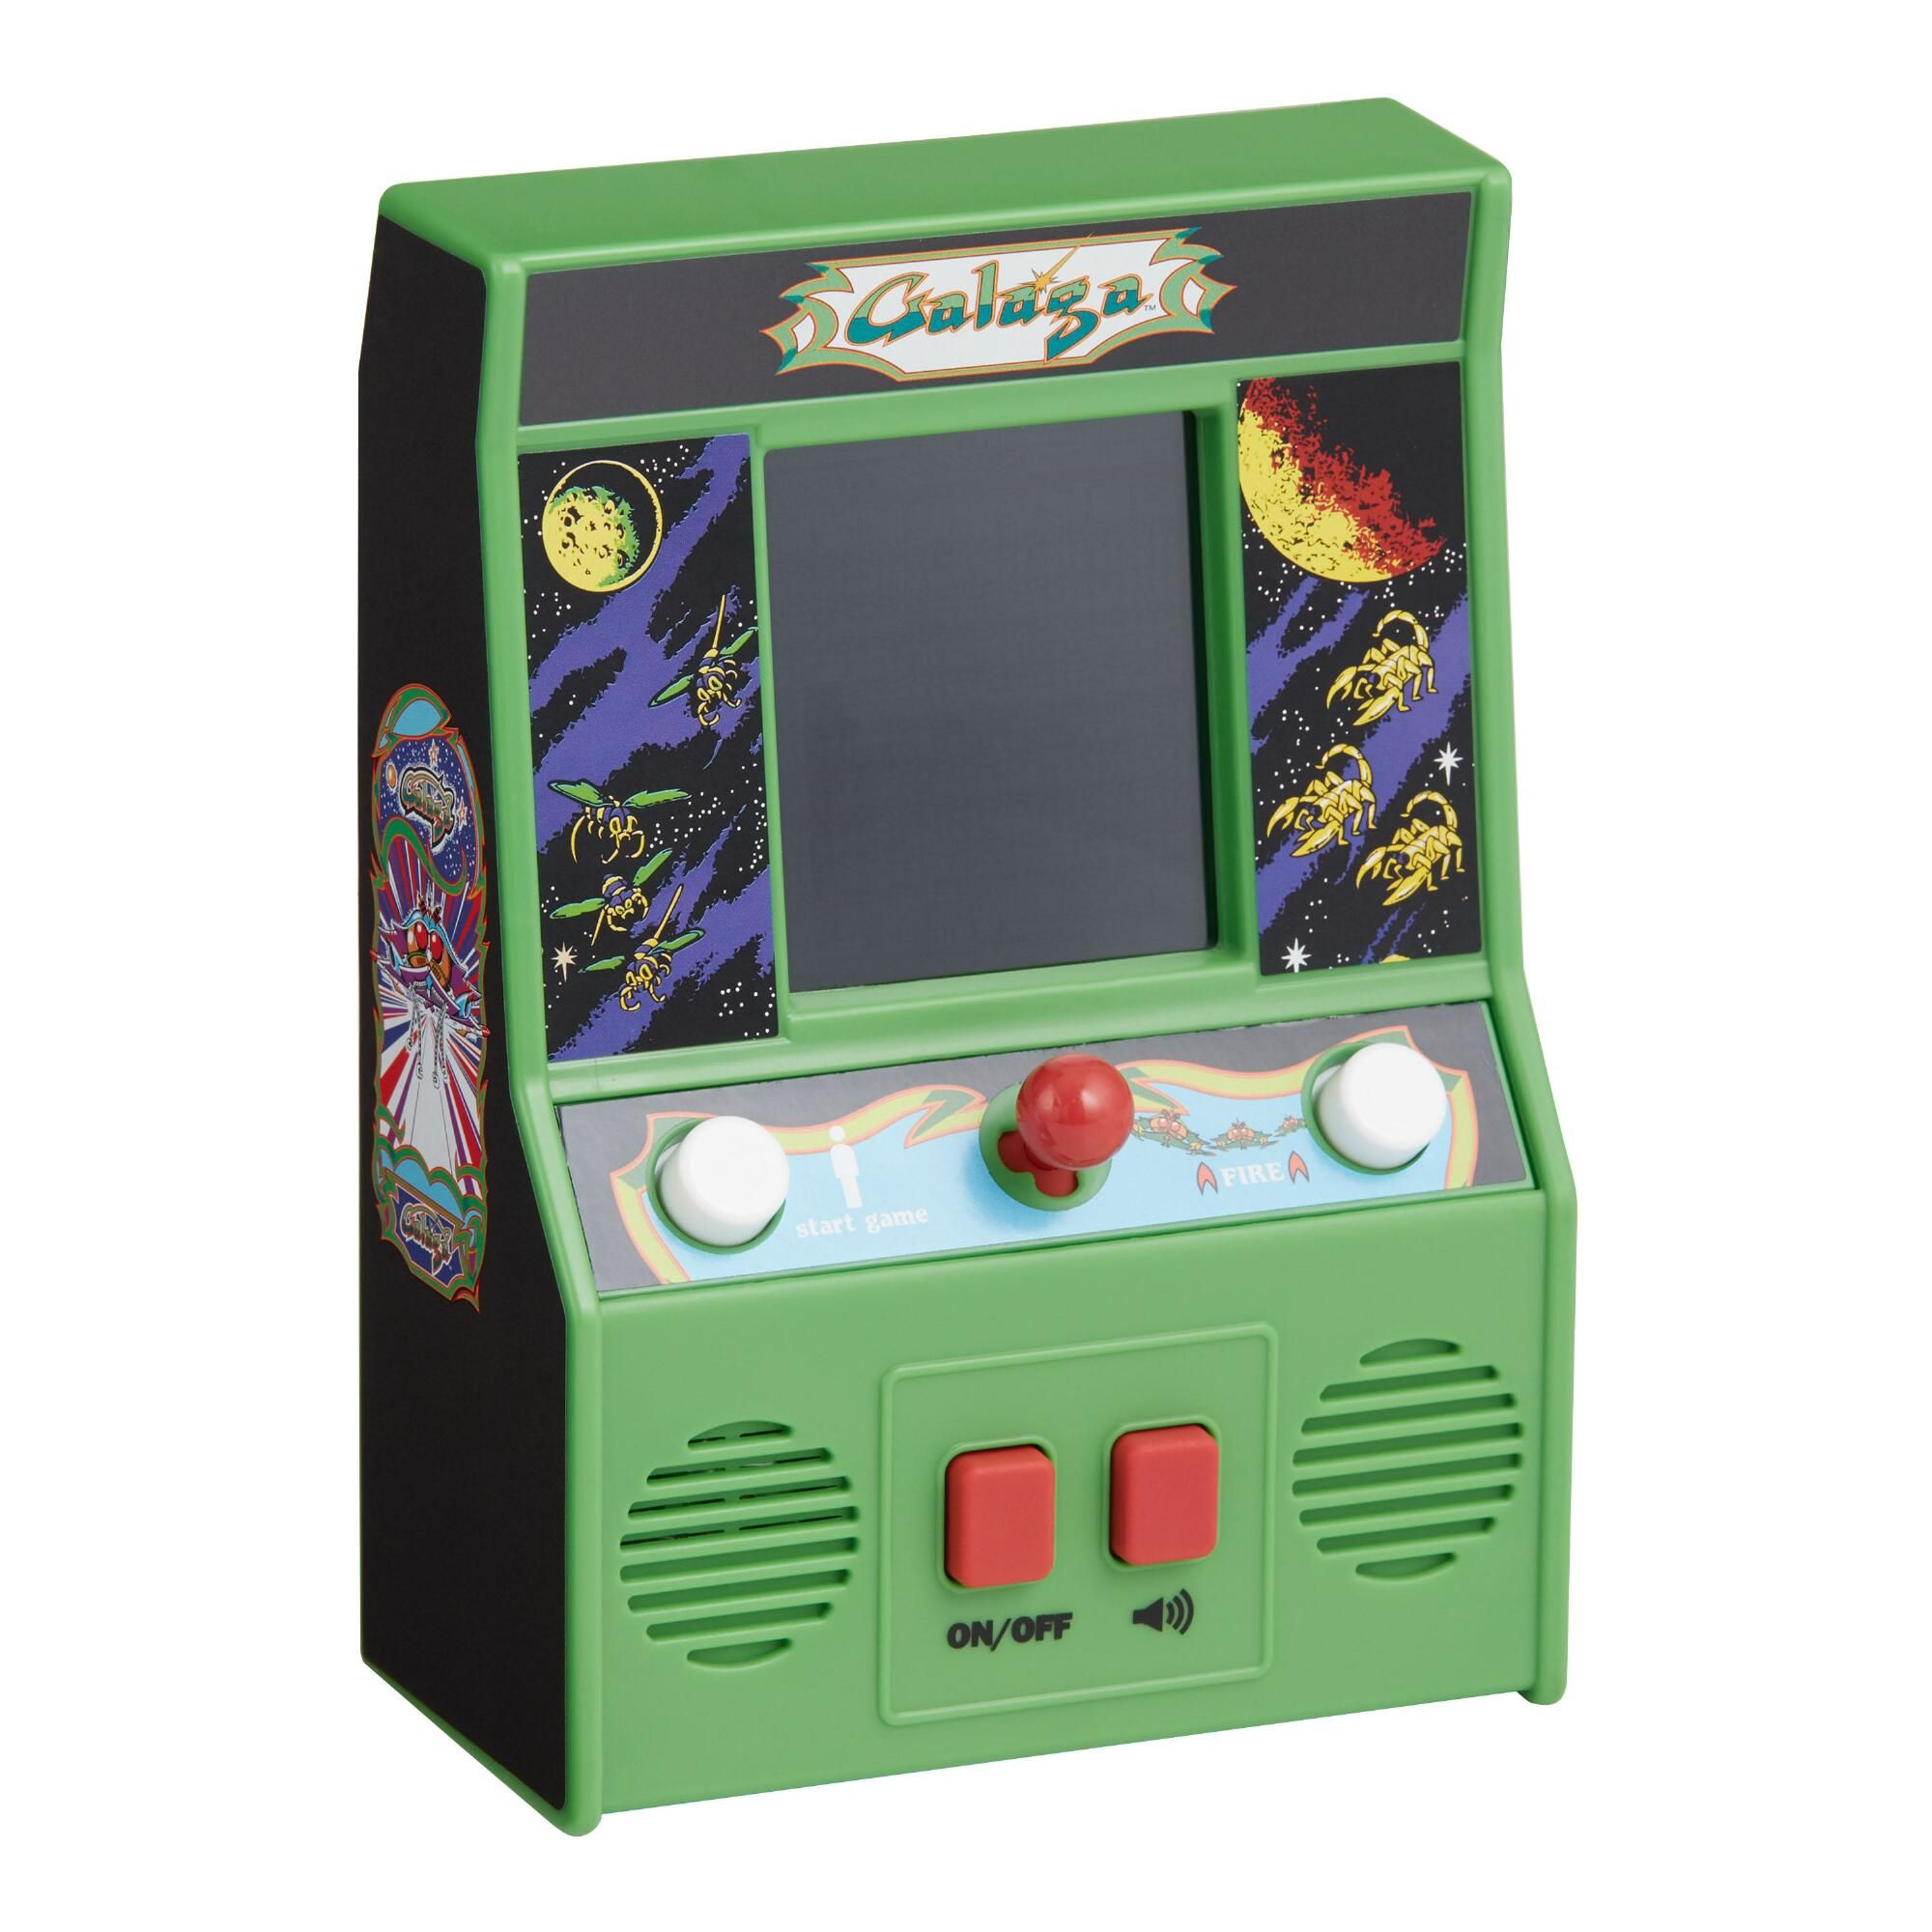 Galaga Handheld Arcade Game by World Market Arcade games